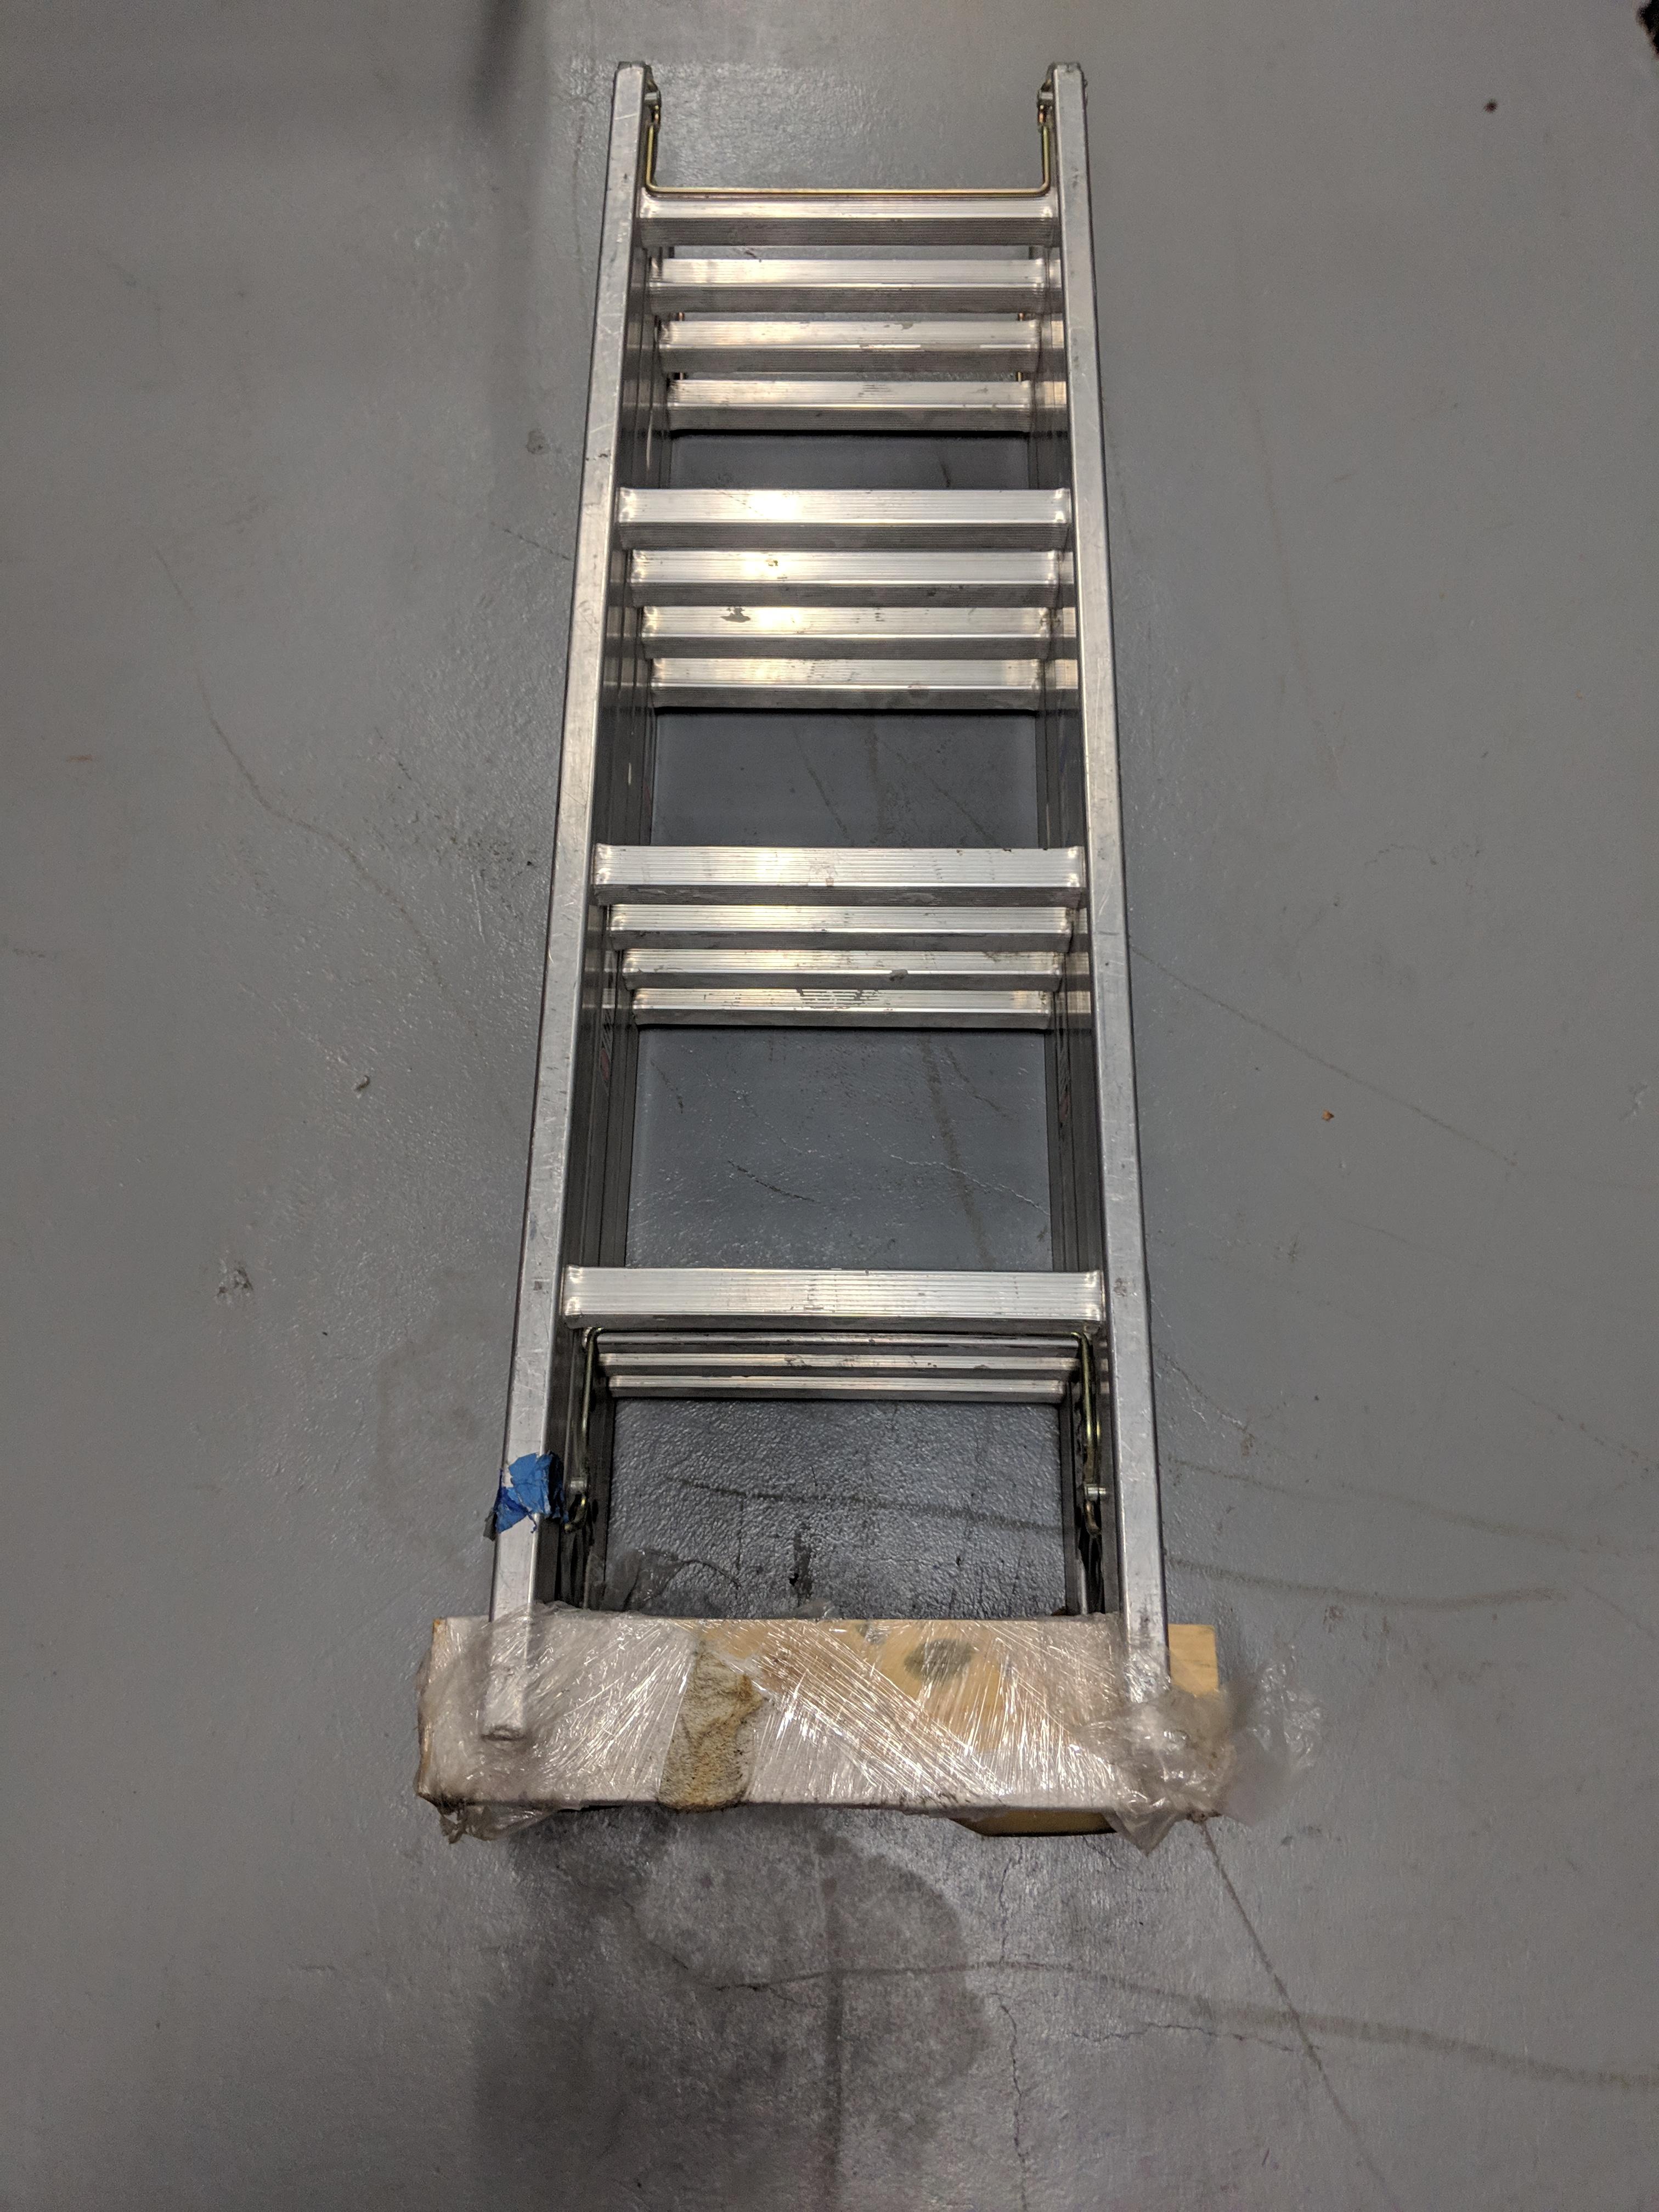 KRAUSE MultiMatic Ladder Type 1A Industrial Extra Heavy 300 lb - $100 (Sherman Oaks)